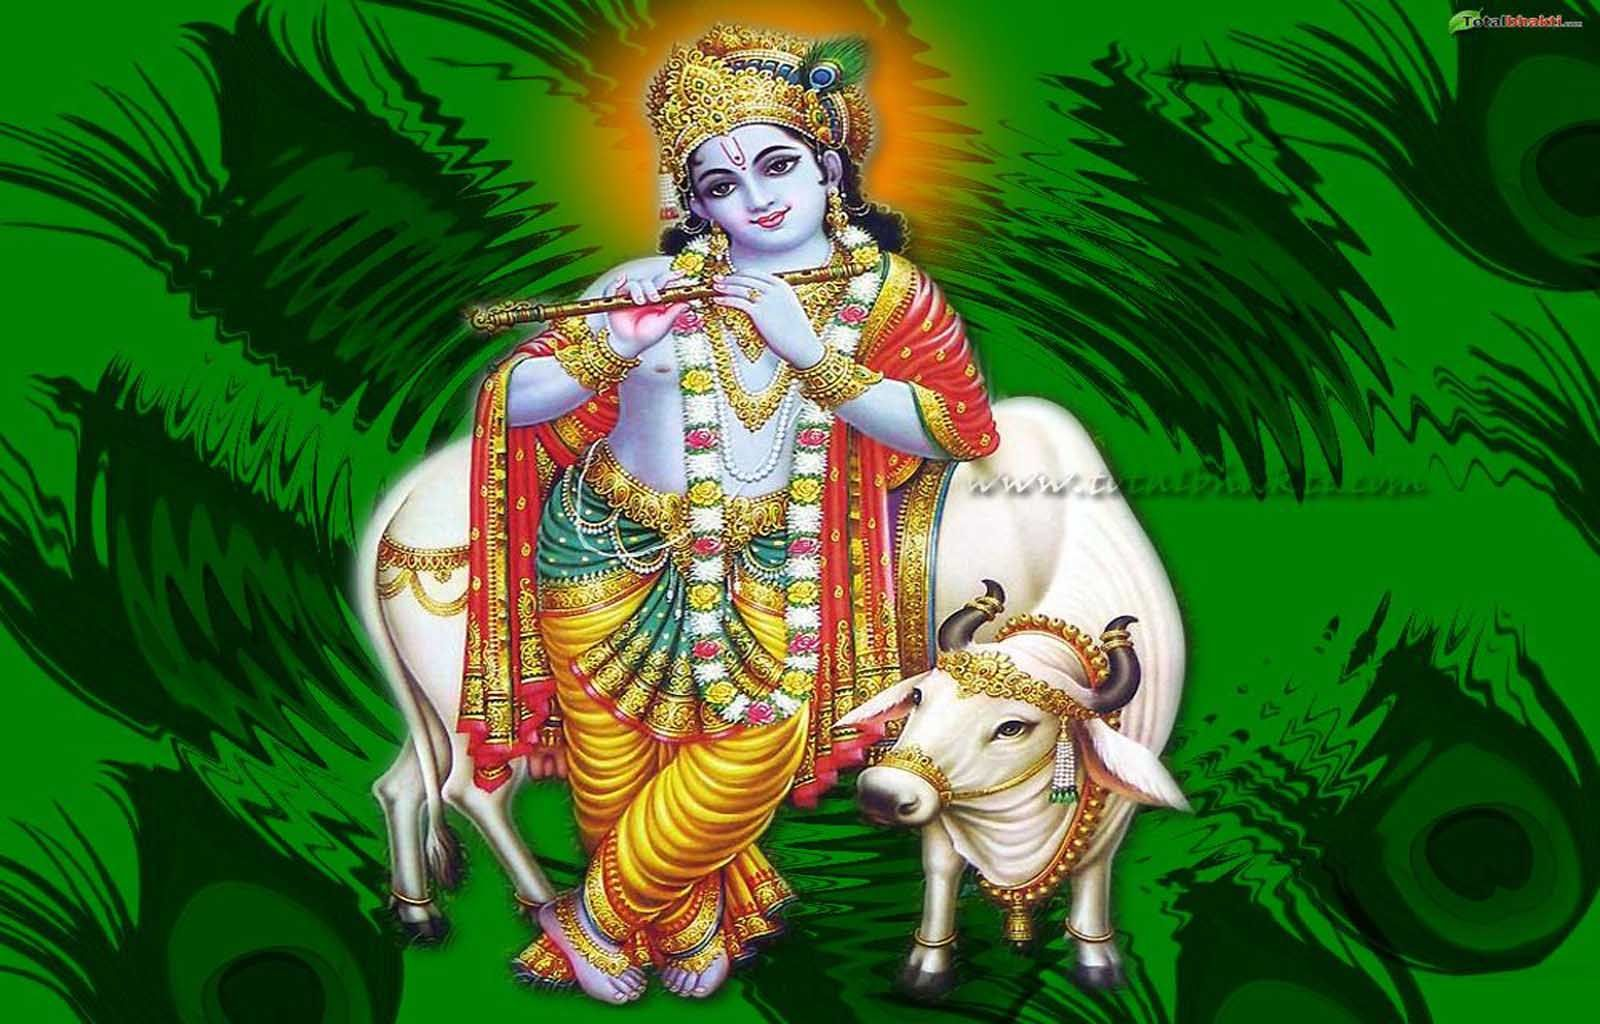 Krishna Wallpaper Hindu Lord Image Green Color Download